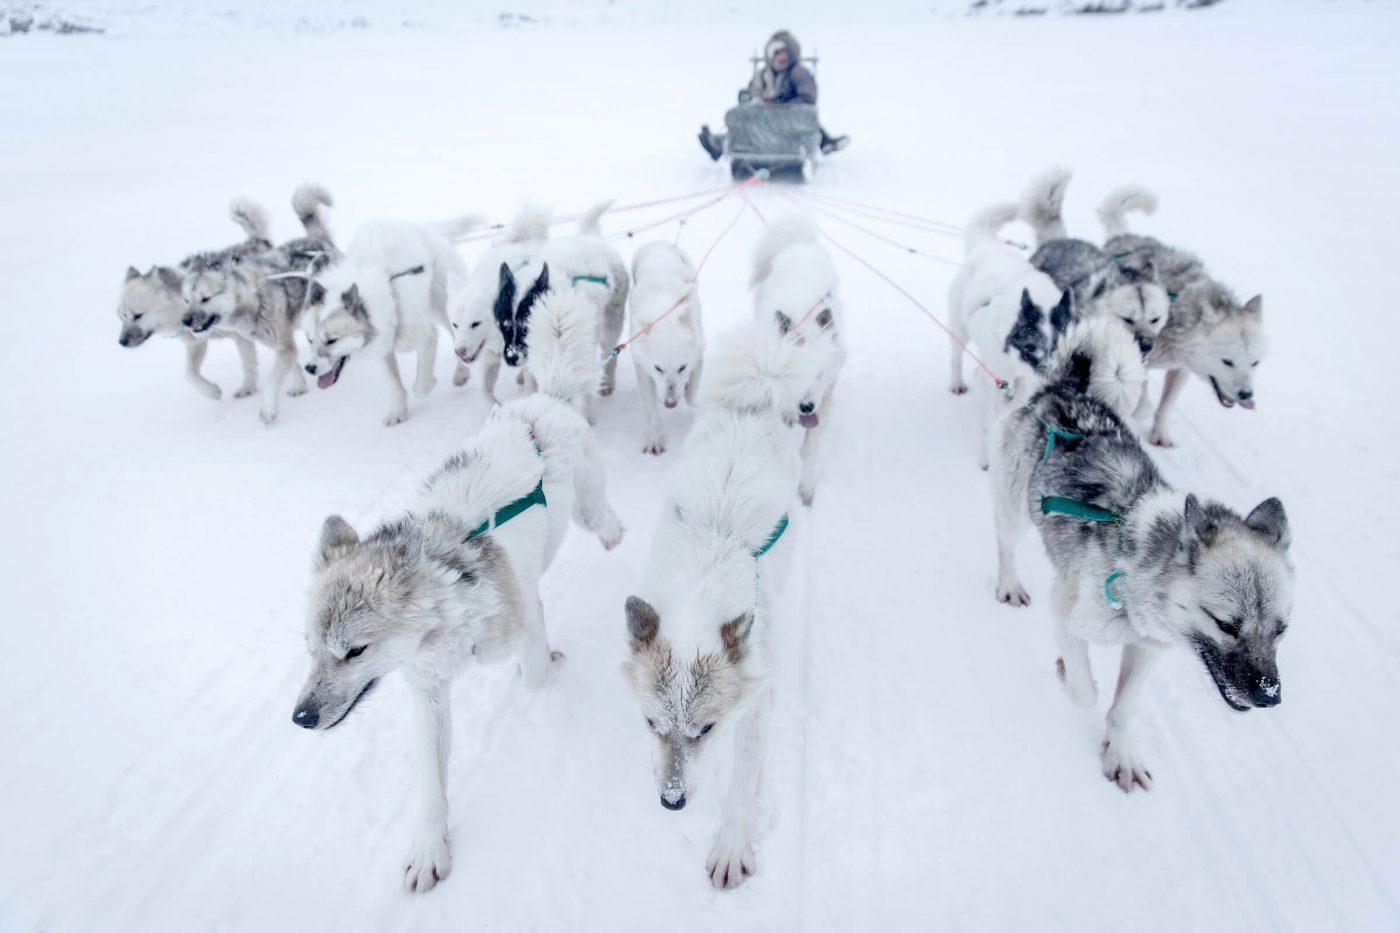 Sled dogs on the sea ice near the coast around Ilulissat in Greenland